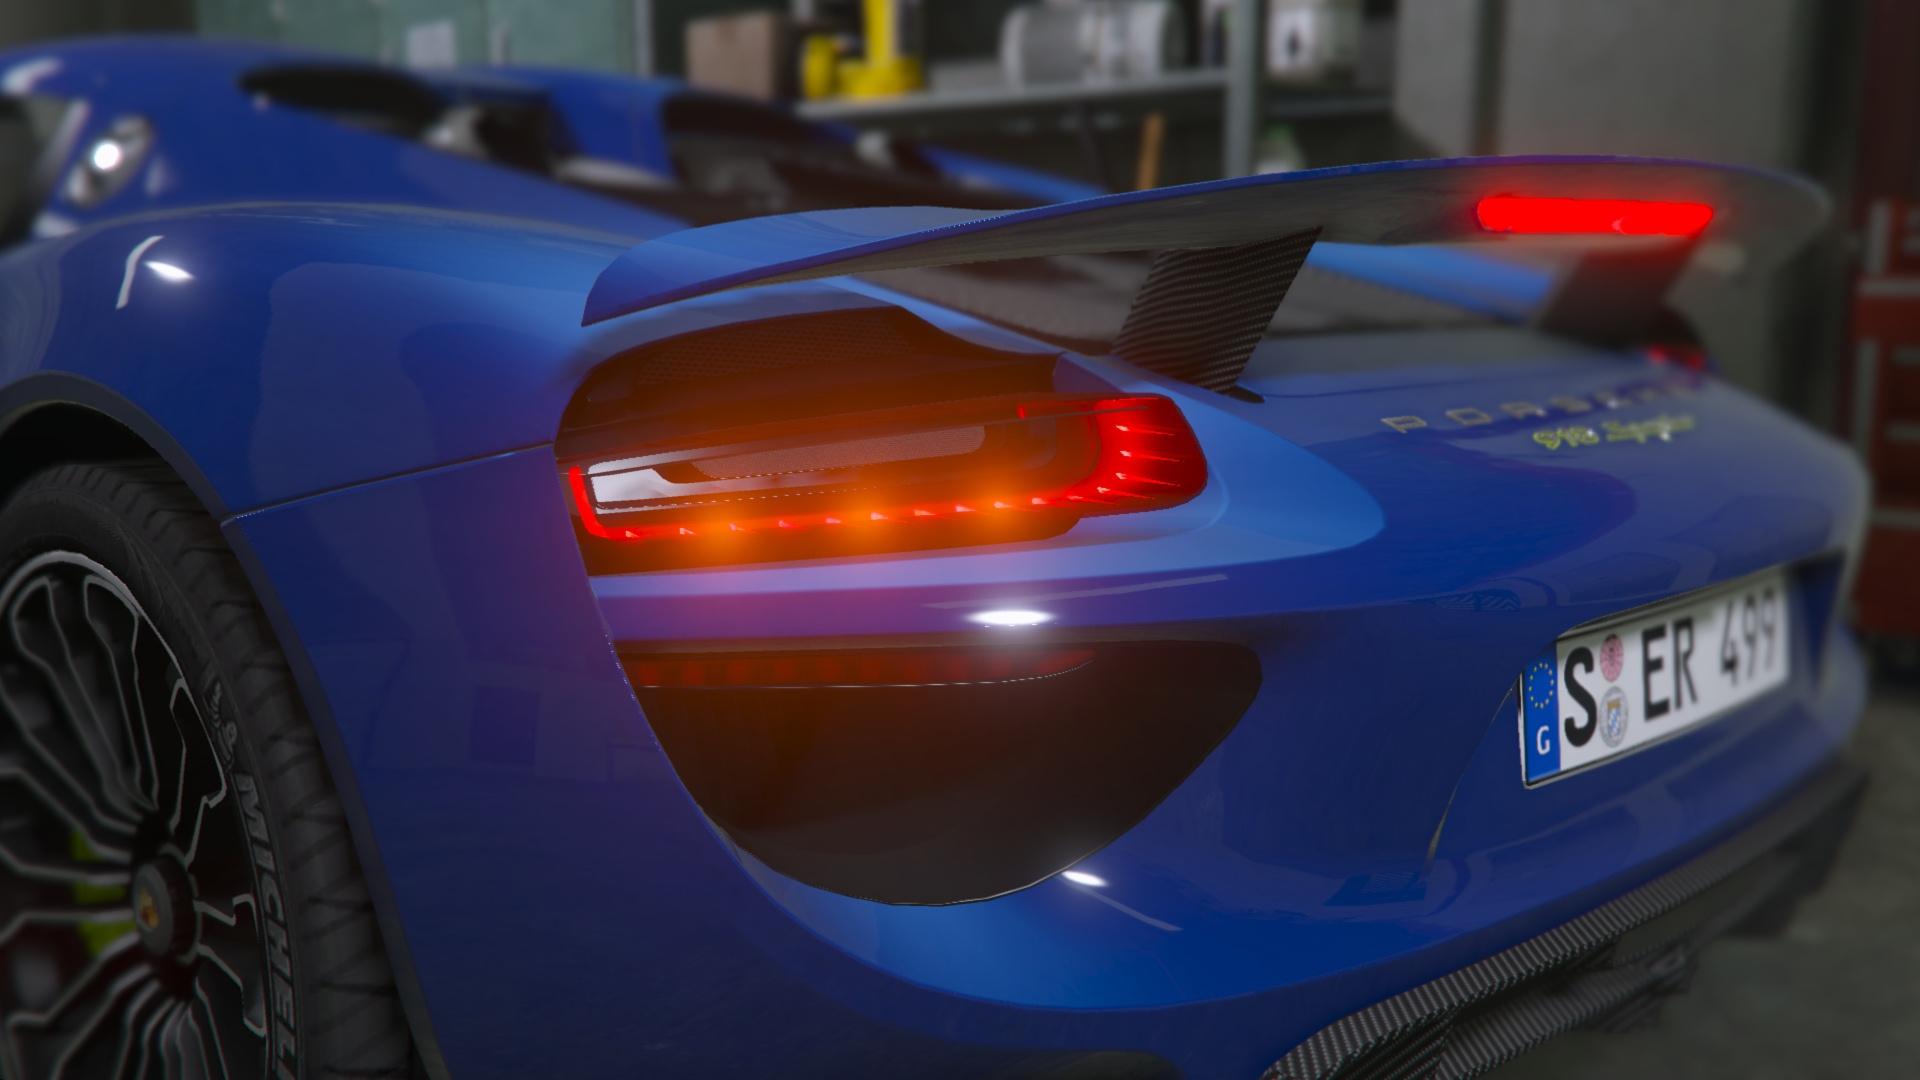 7433e7-GTA5%202015-09-15%2021-51-30-19_%E7%9C%8B%E5%9B%BE%E7%8E%8B Stunning Porsche 918 Spyder Paint Job Cars Trend